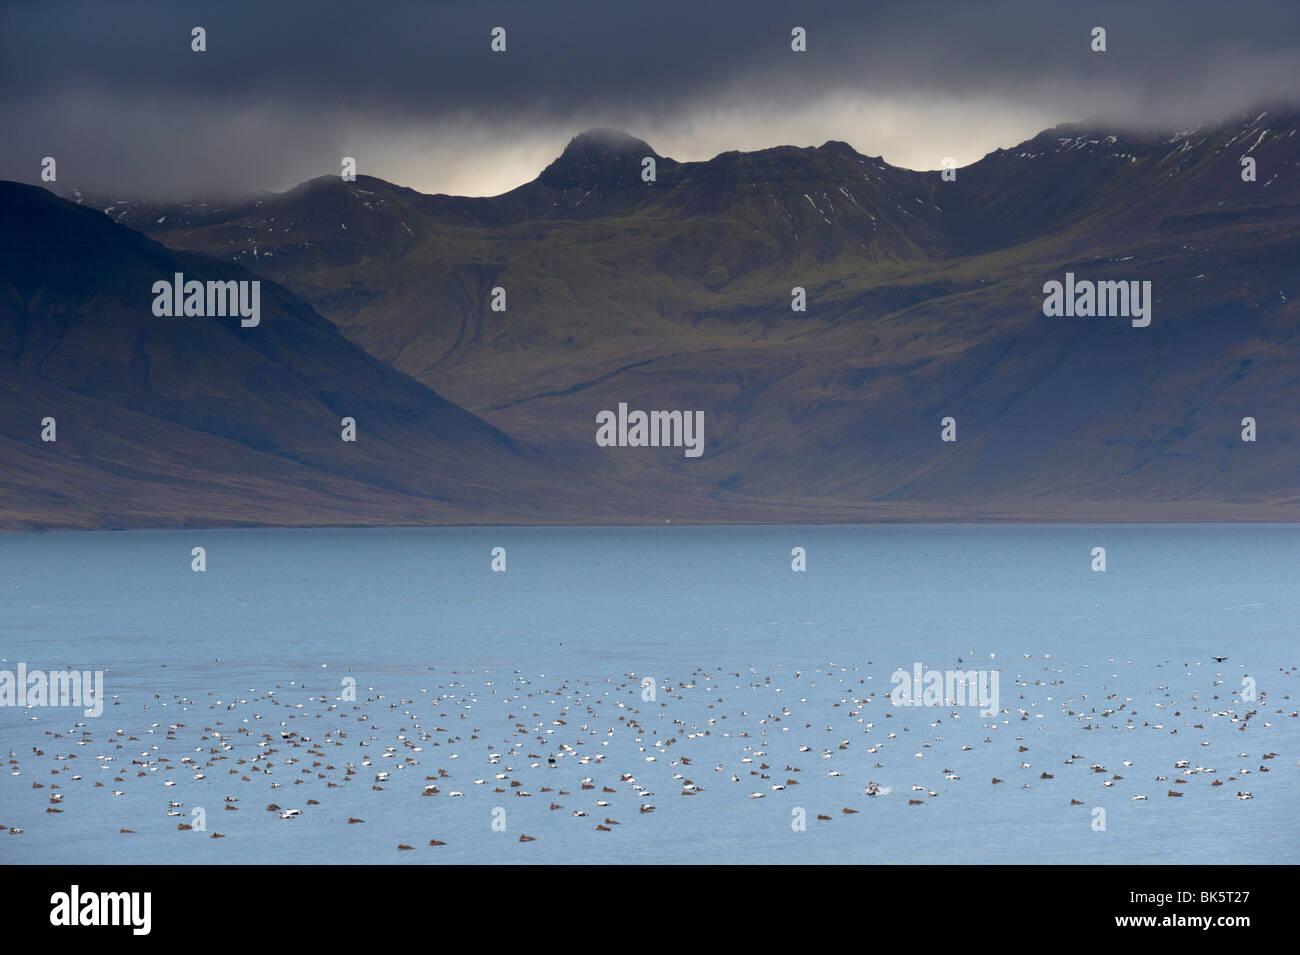 Flocks of Eider ducks on sheltered waters of Kolgrafafjordur fjord near Grundarfjordur, Snaefellsnes Peninsula, - Stock Image